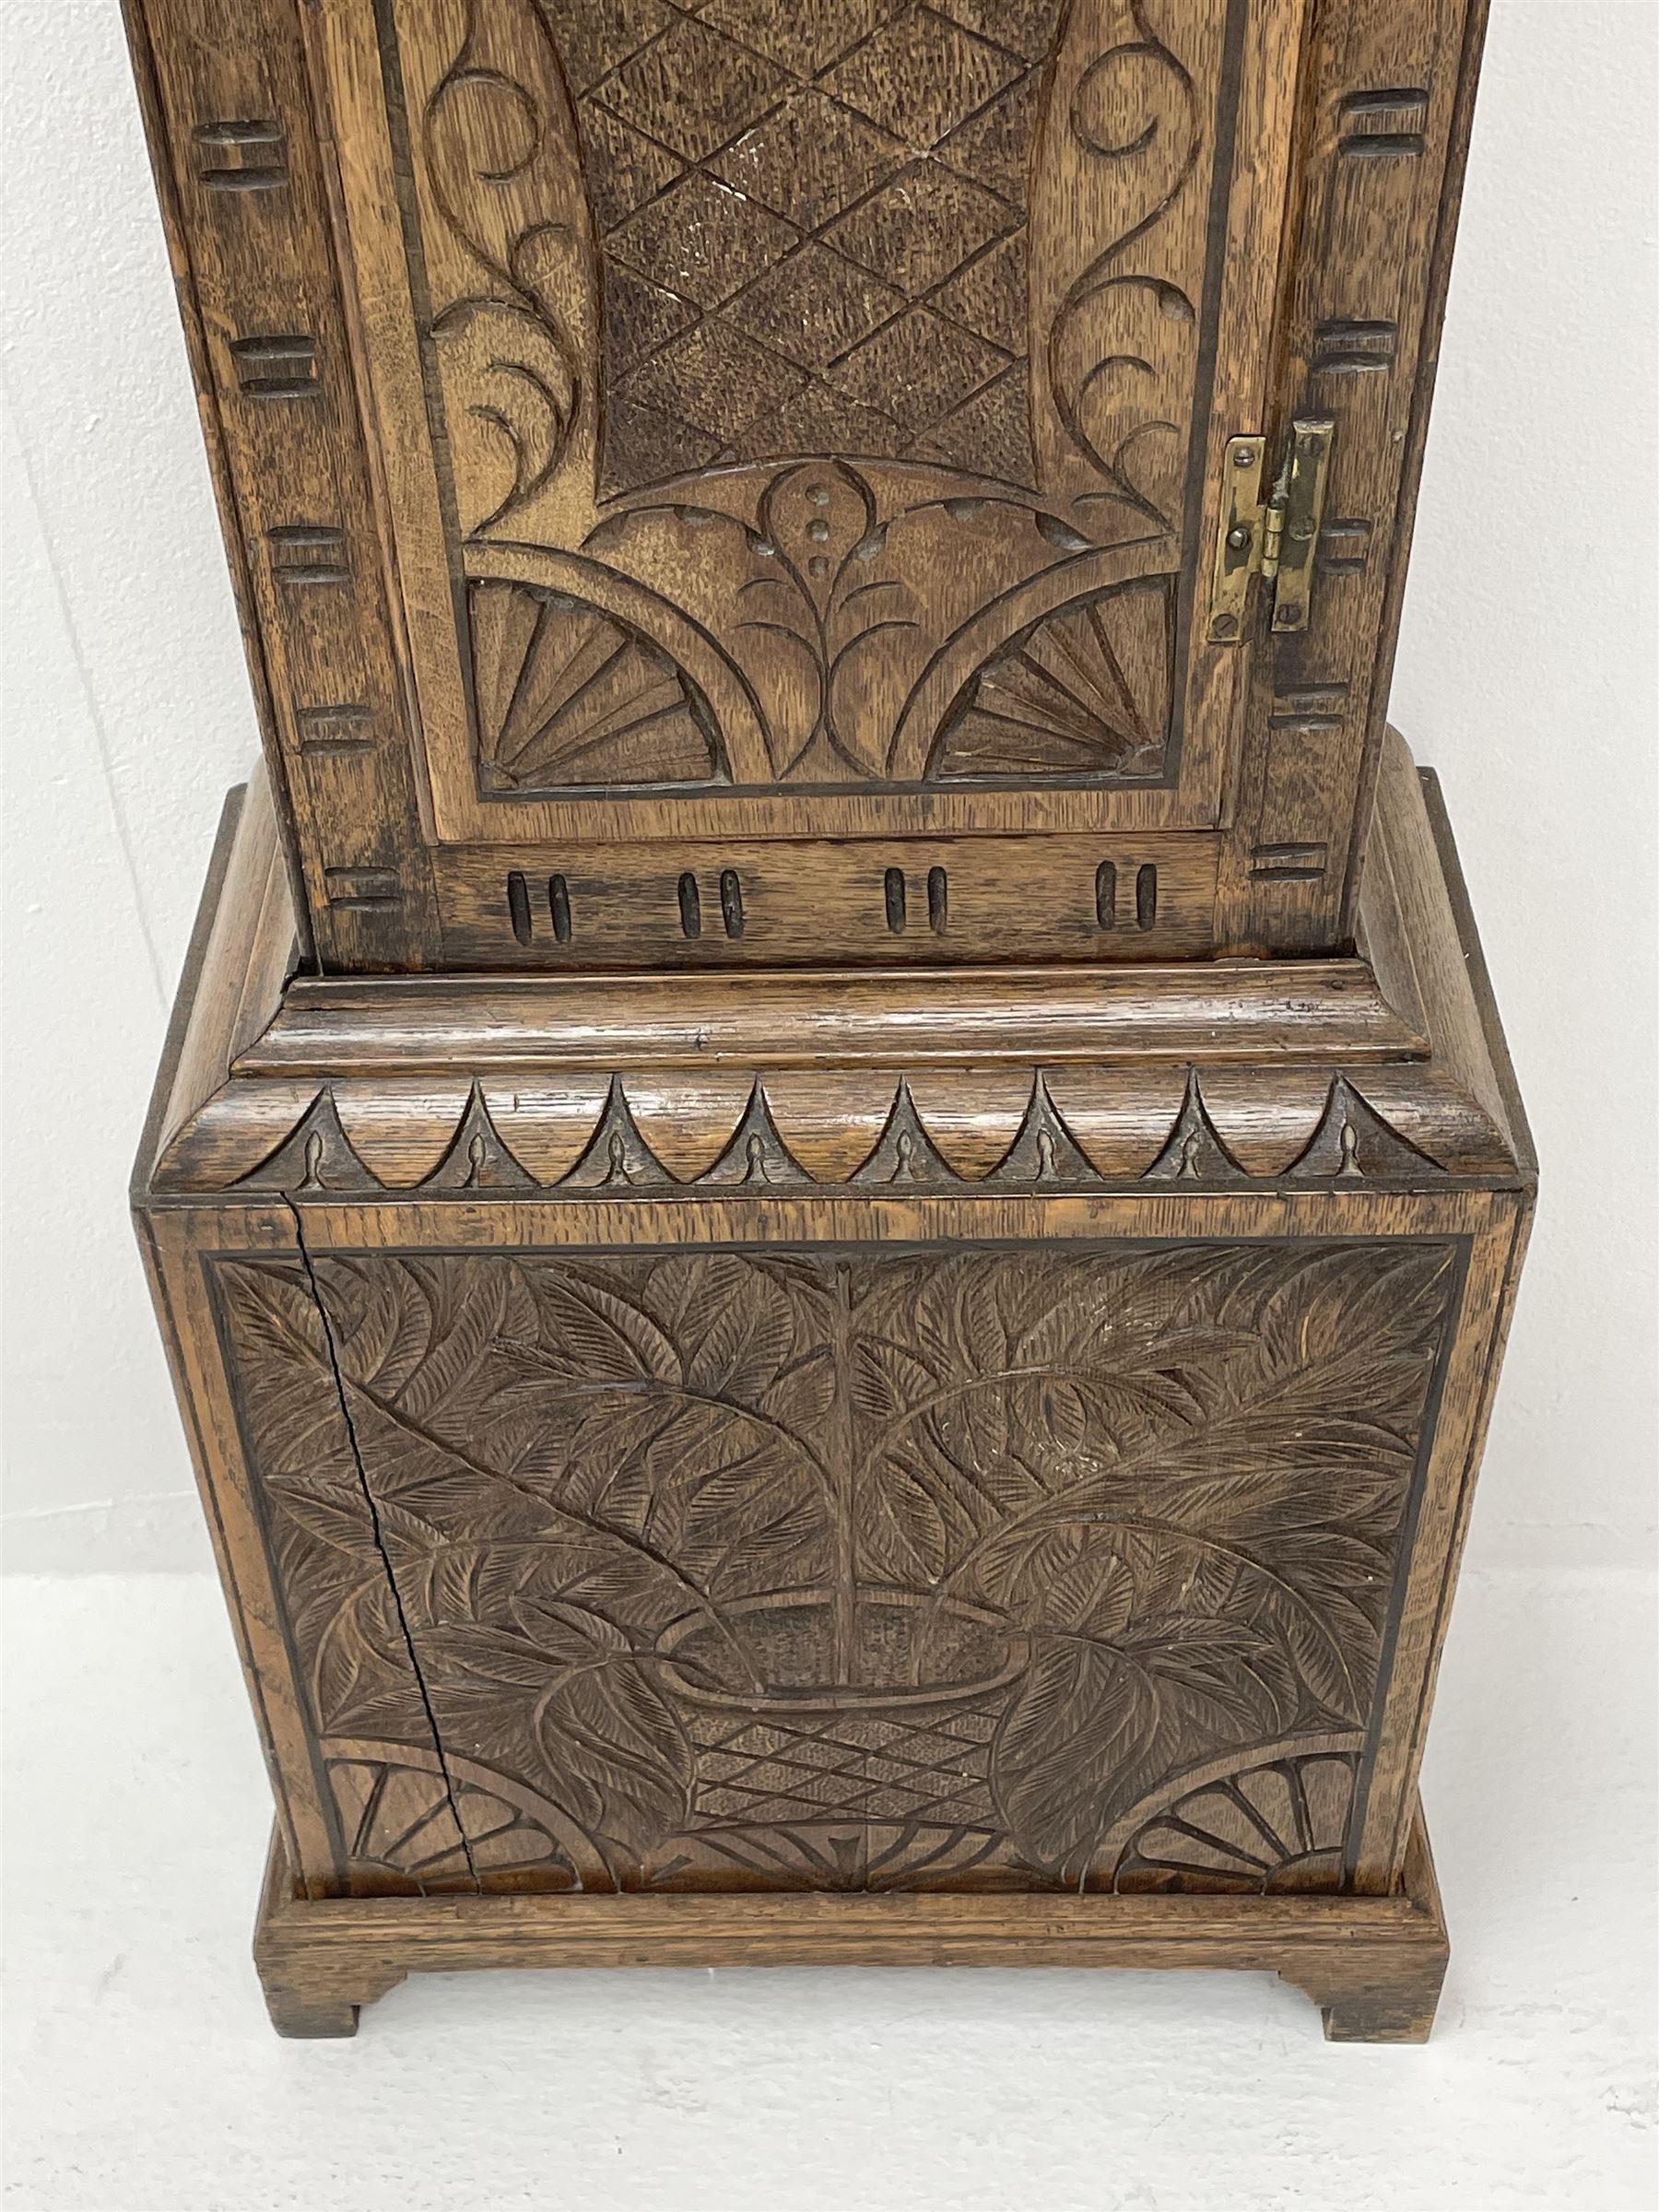 19th century carved oak longcase clock - Image 7 of 10